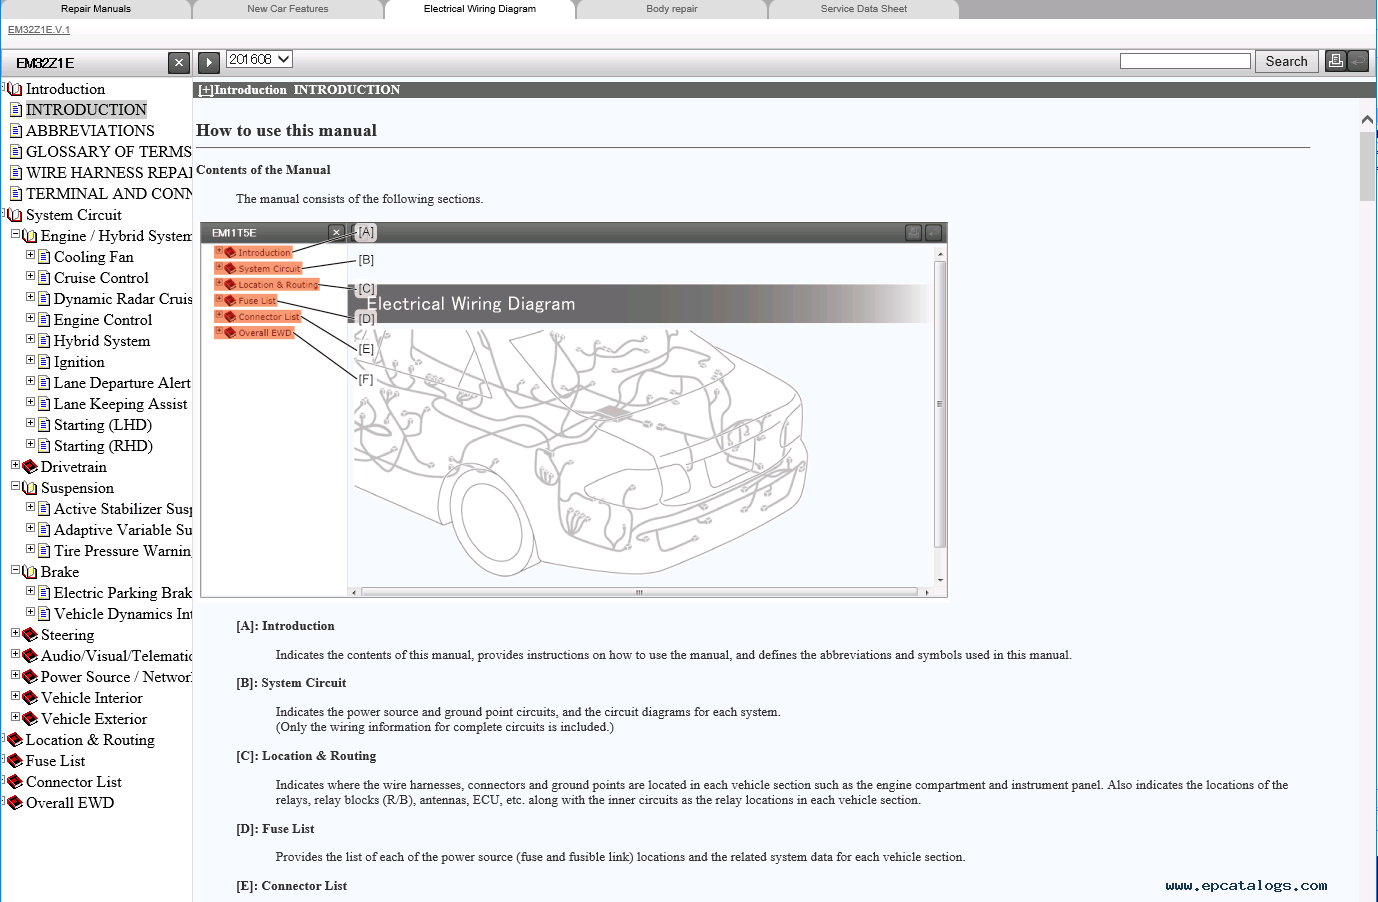 Lexus Rx450h Wiring Diagram Portal 1990 Ls400 Gyl25 Repair Manual 2015 Rh Epcatalogs Com Audio 1998 Lx470